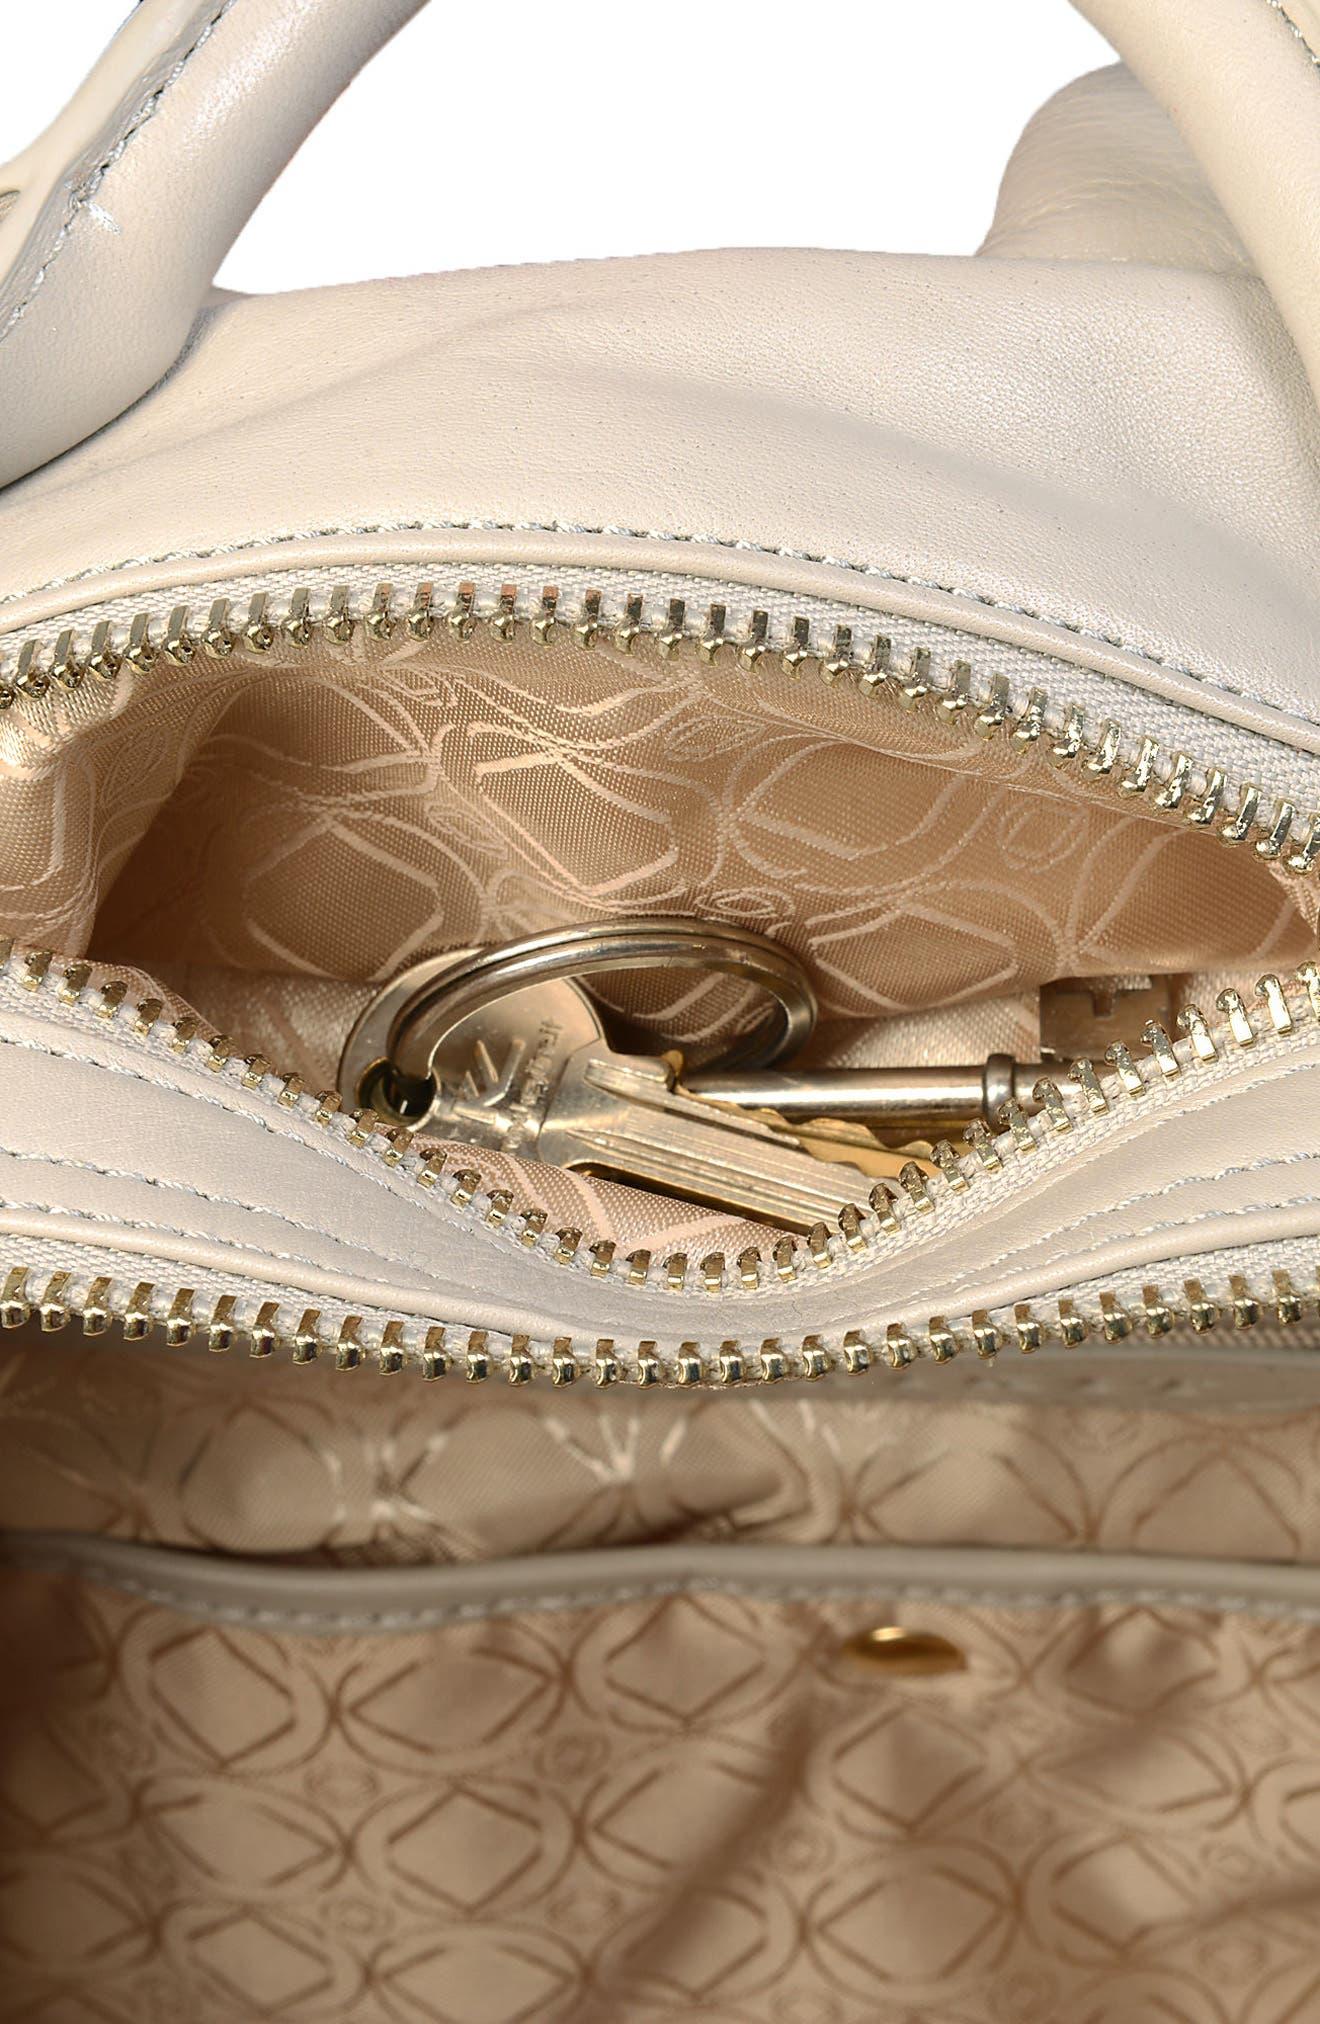 Joy XL Leather Backpack,                             Alternate thumbnail 12, color,                             Ice Grey